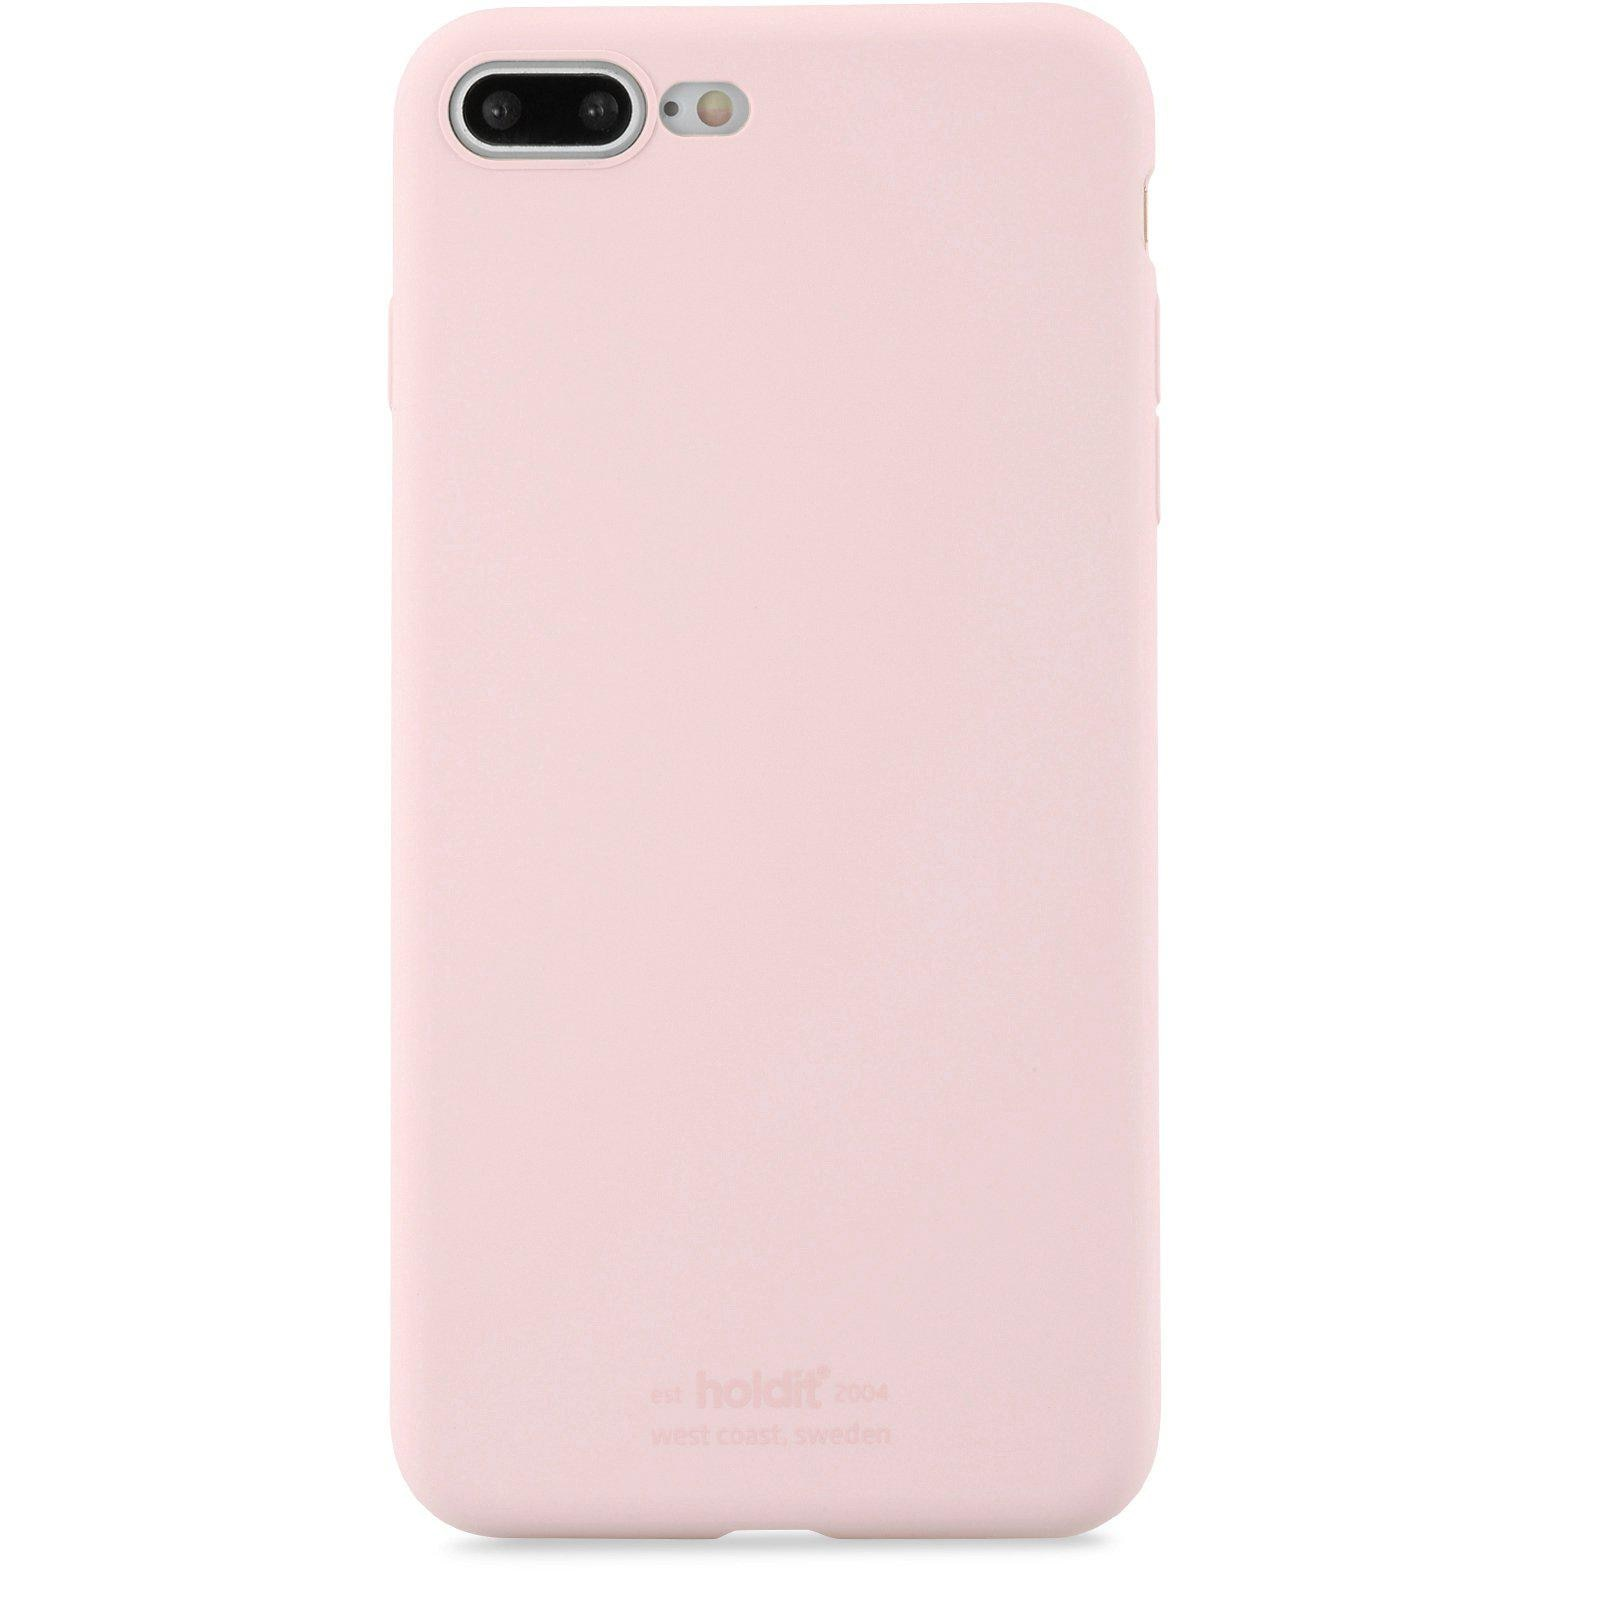 Silikonikuori iPhone 7 Plus/8 Plus Blush Pink